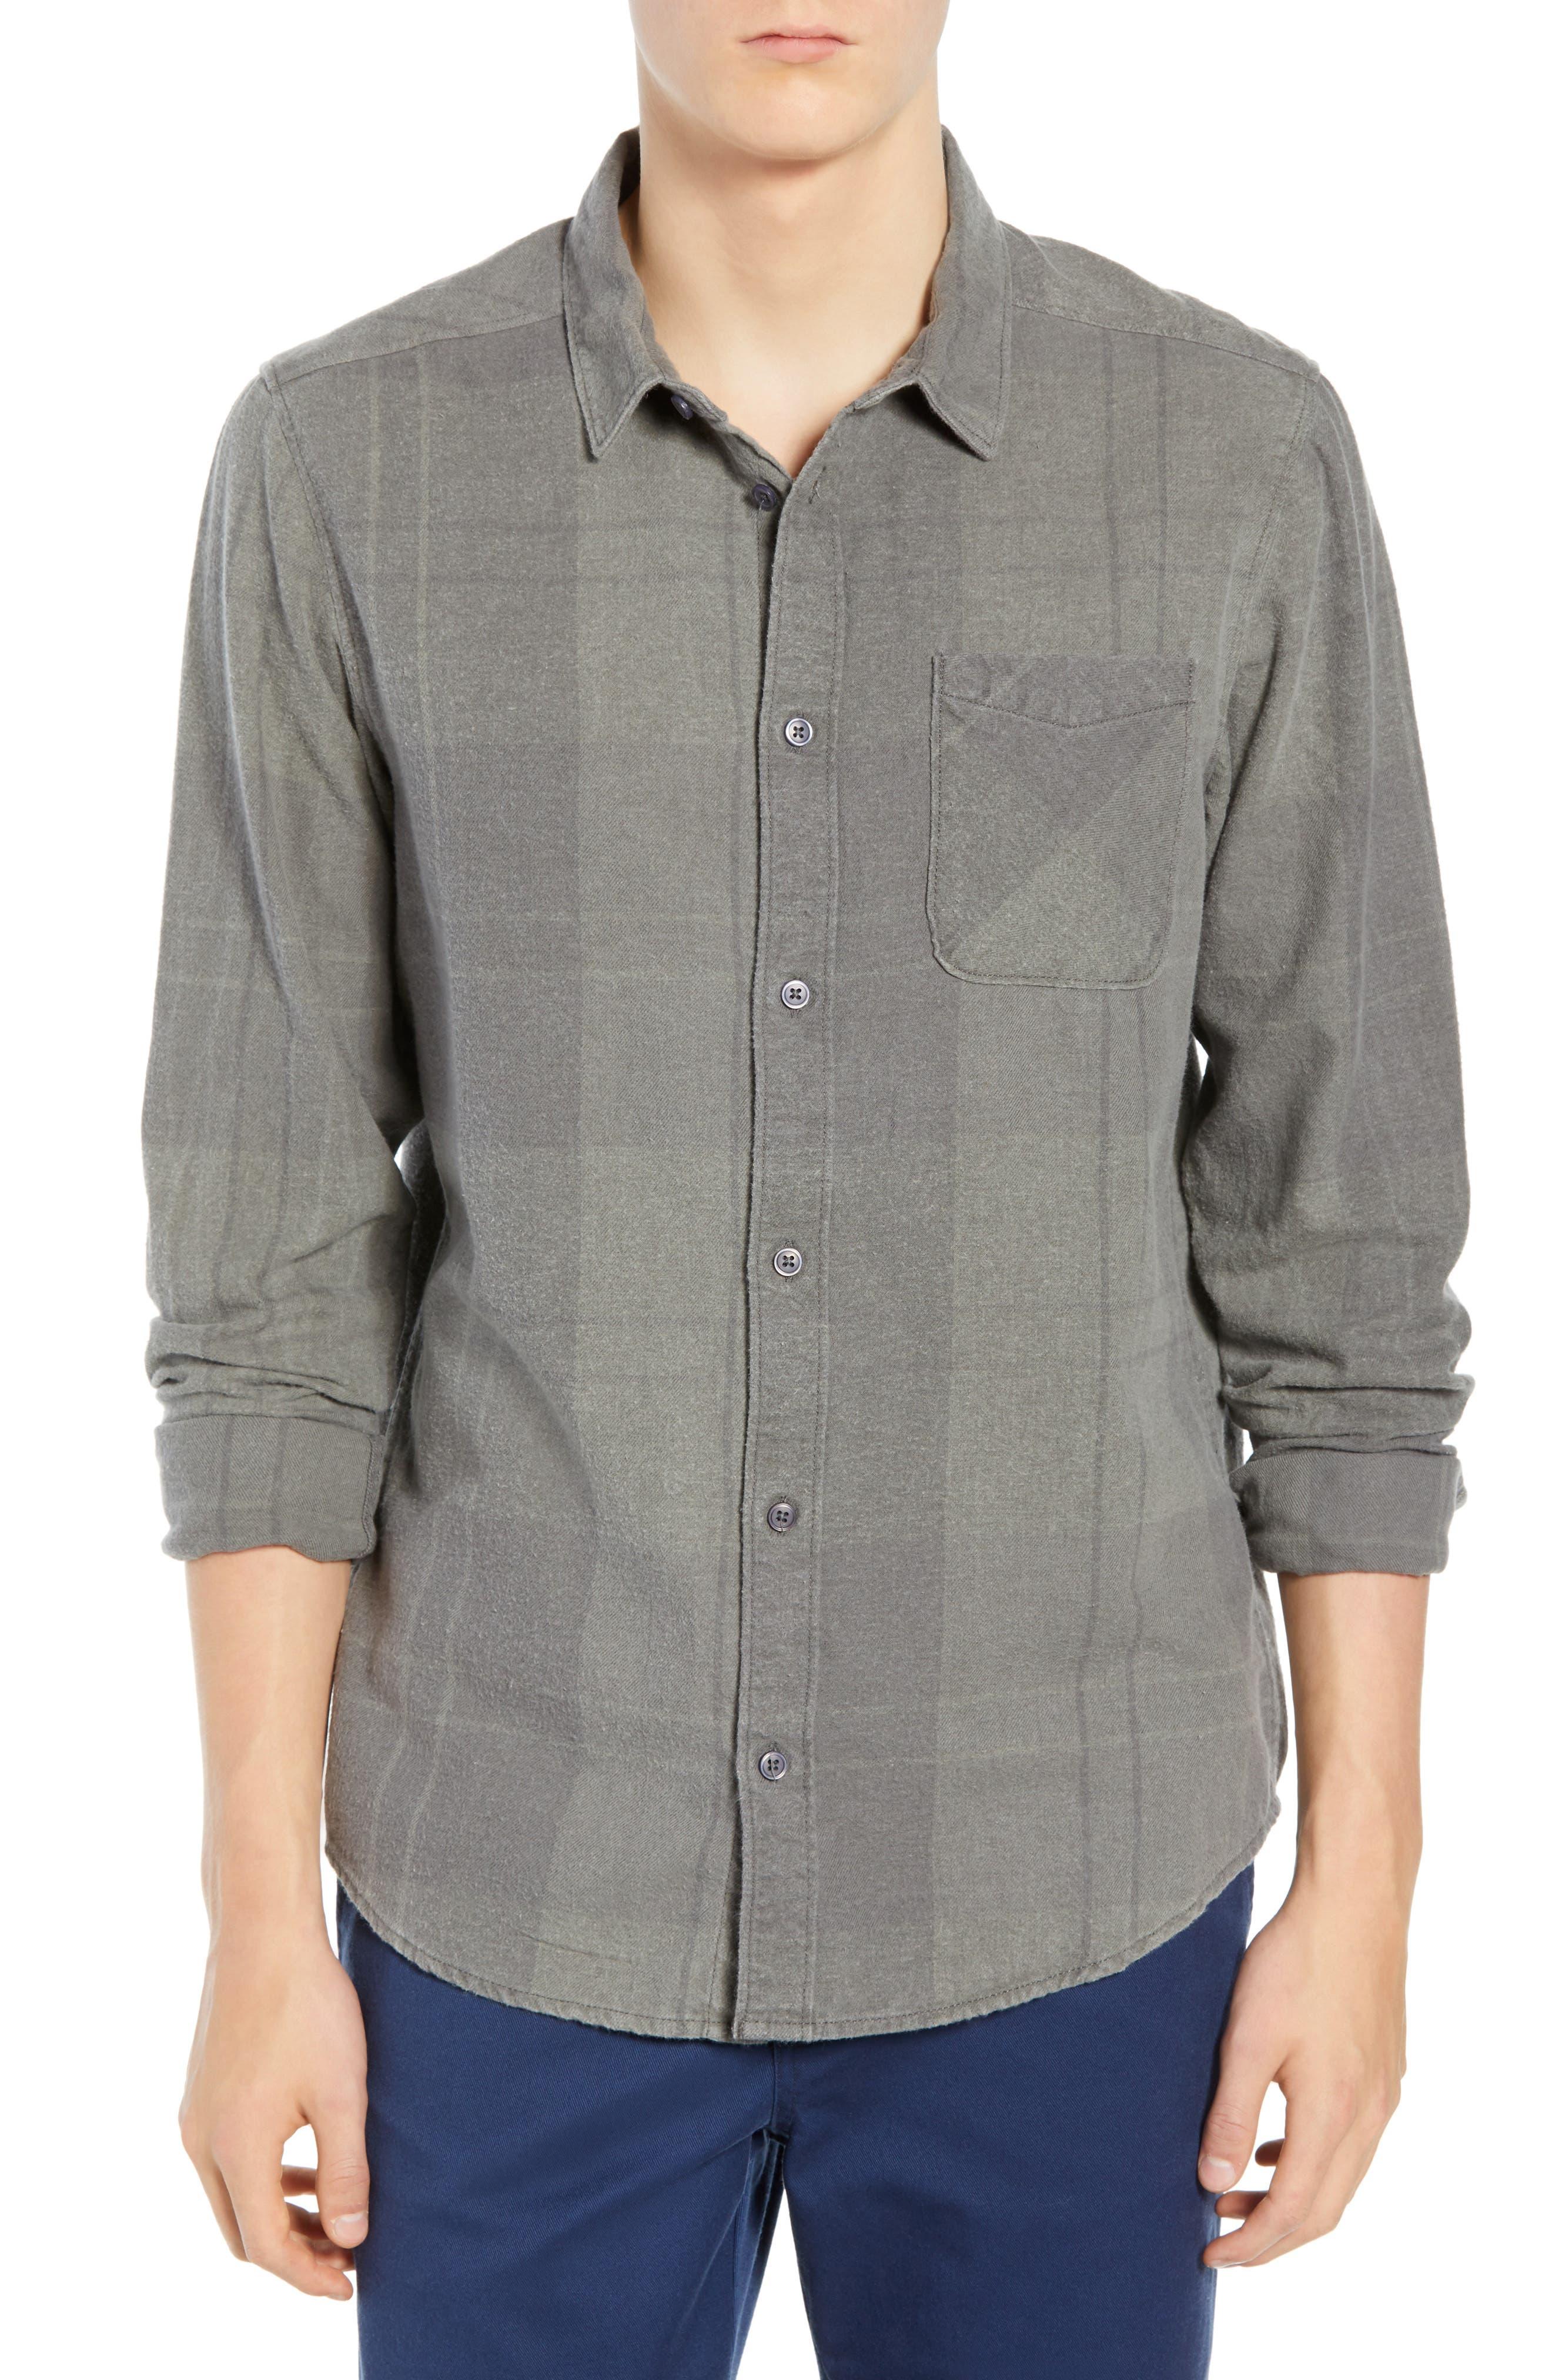 Rvca Good Stuff Check Flannel Shirt, Grey